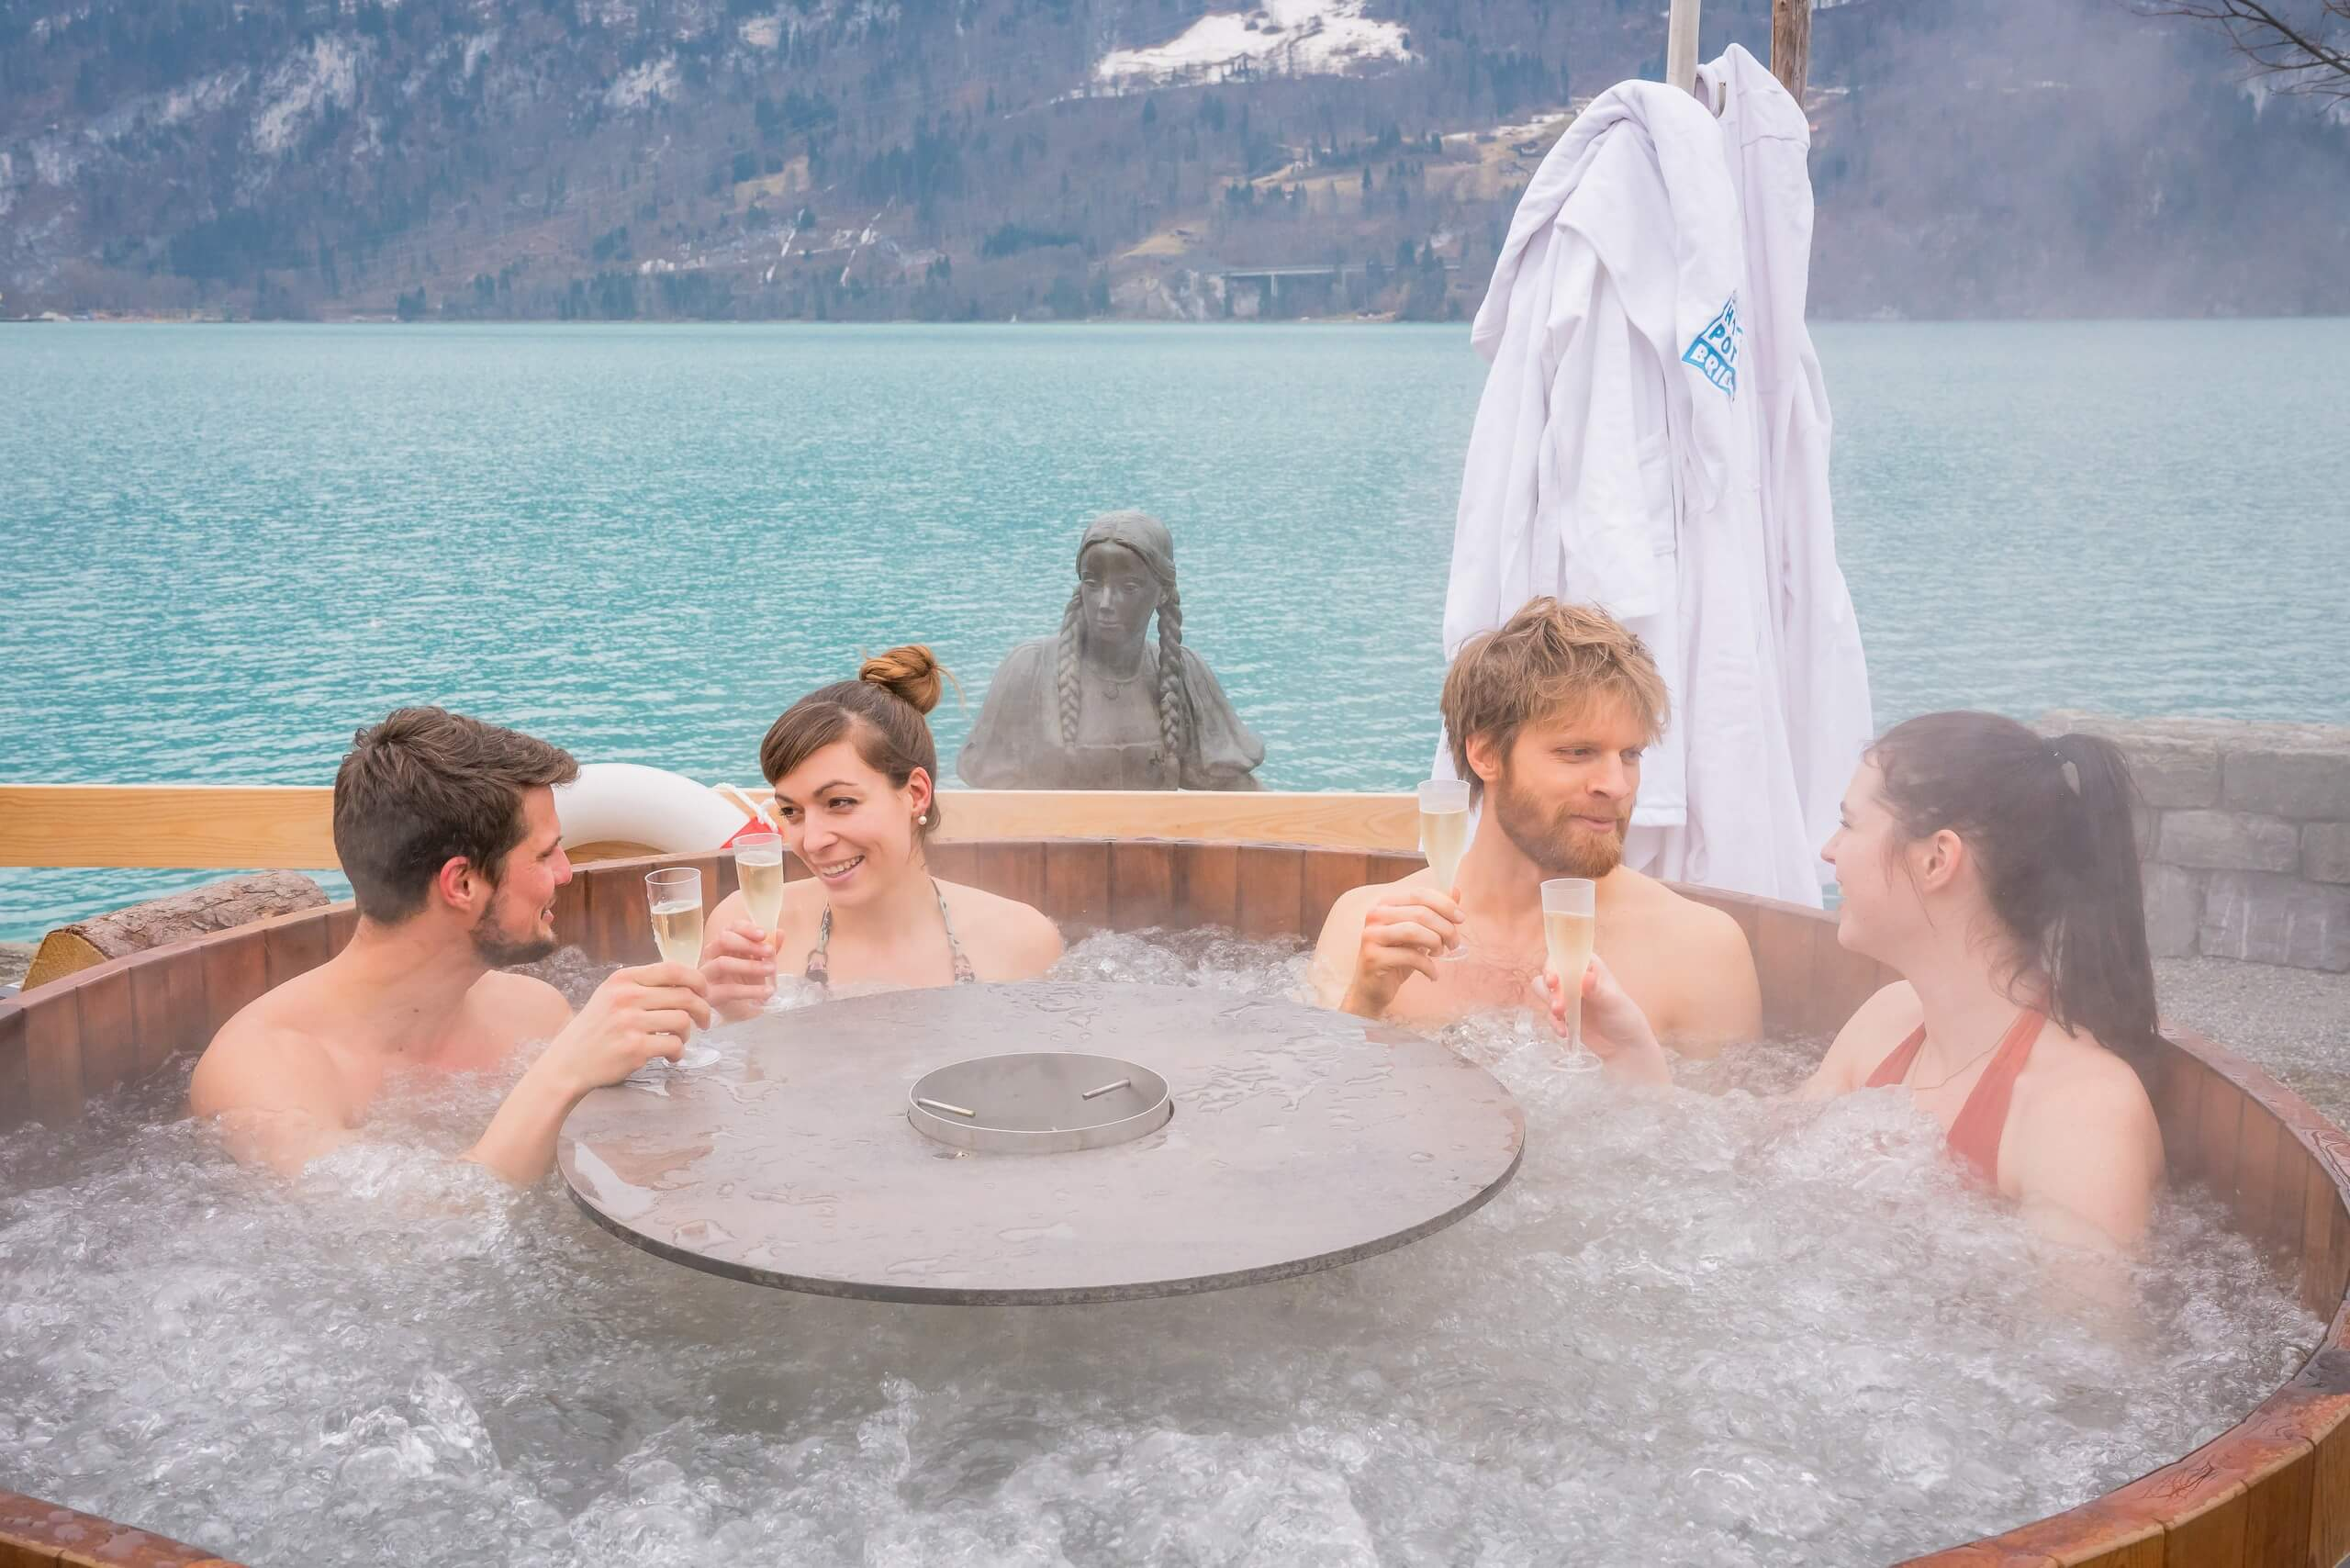 brienz-hot-pot-winter-tag-gruppe-cueppli-wellness